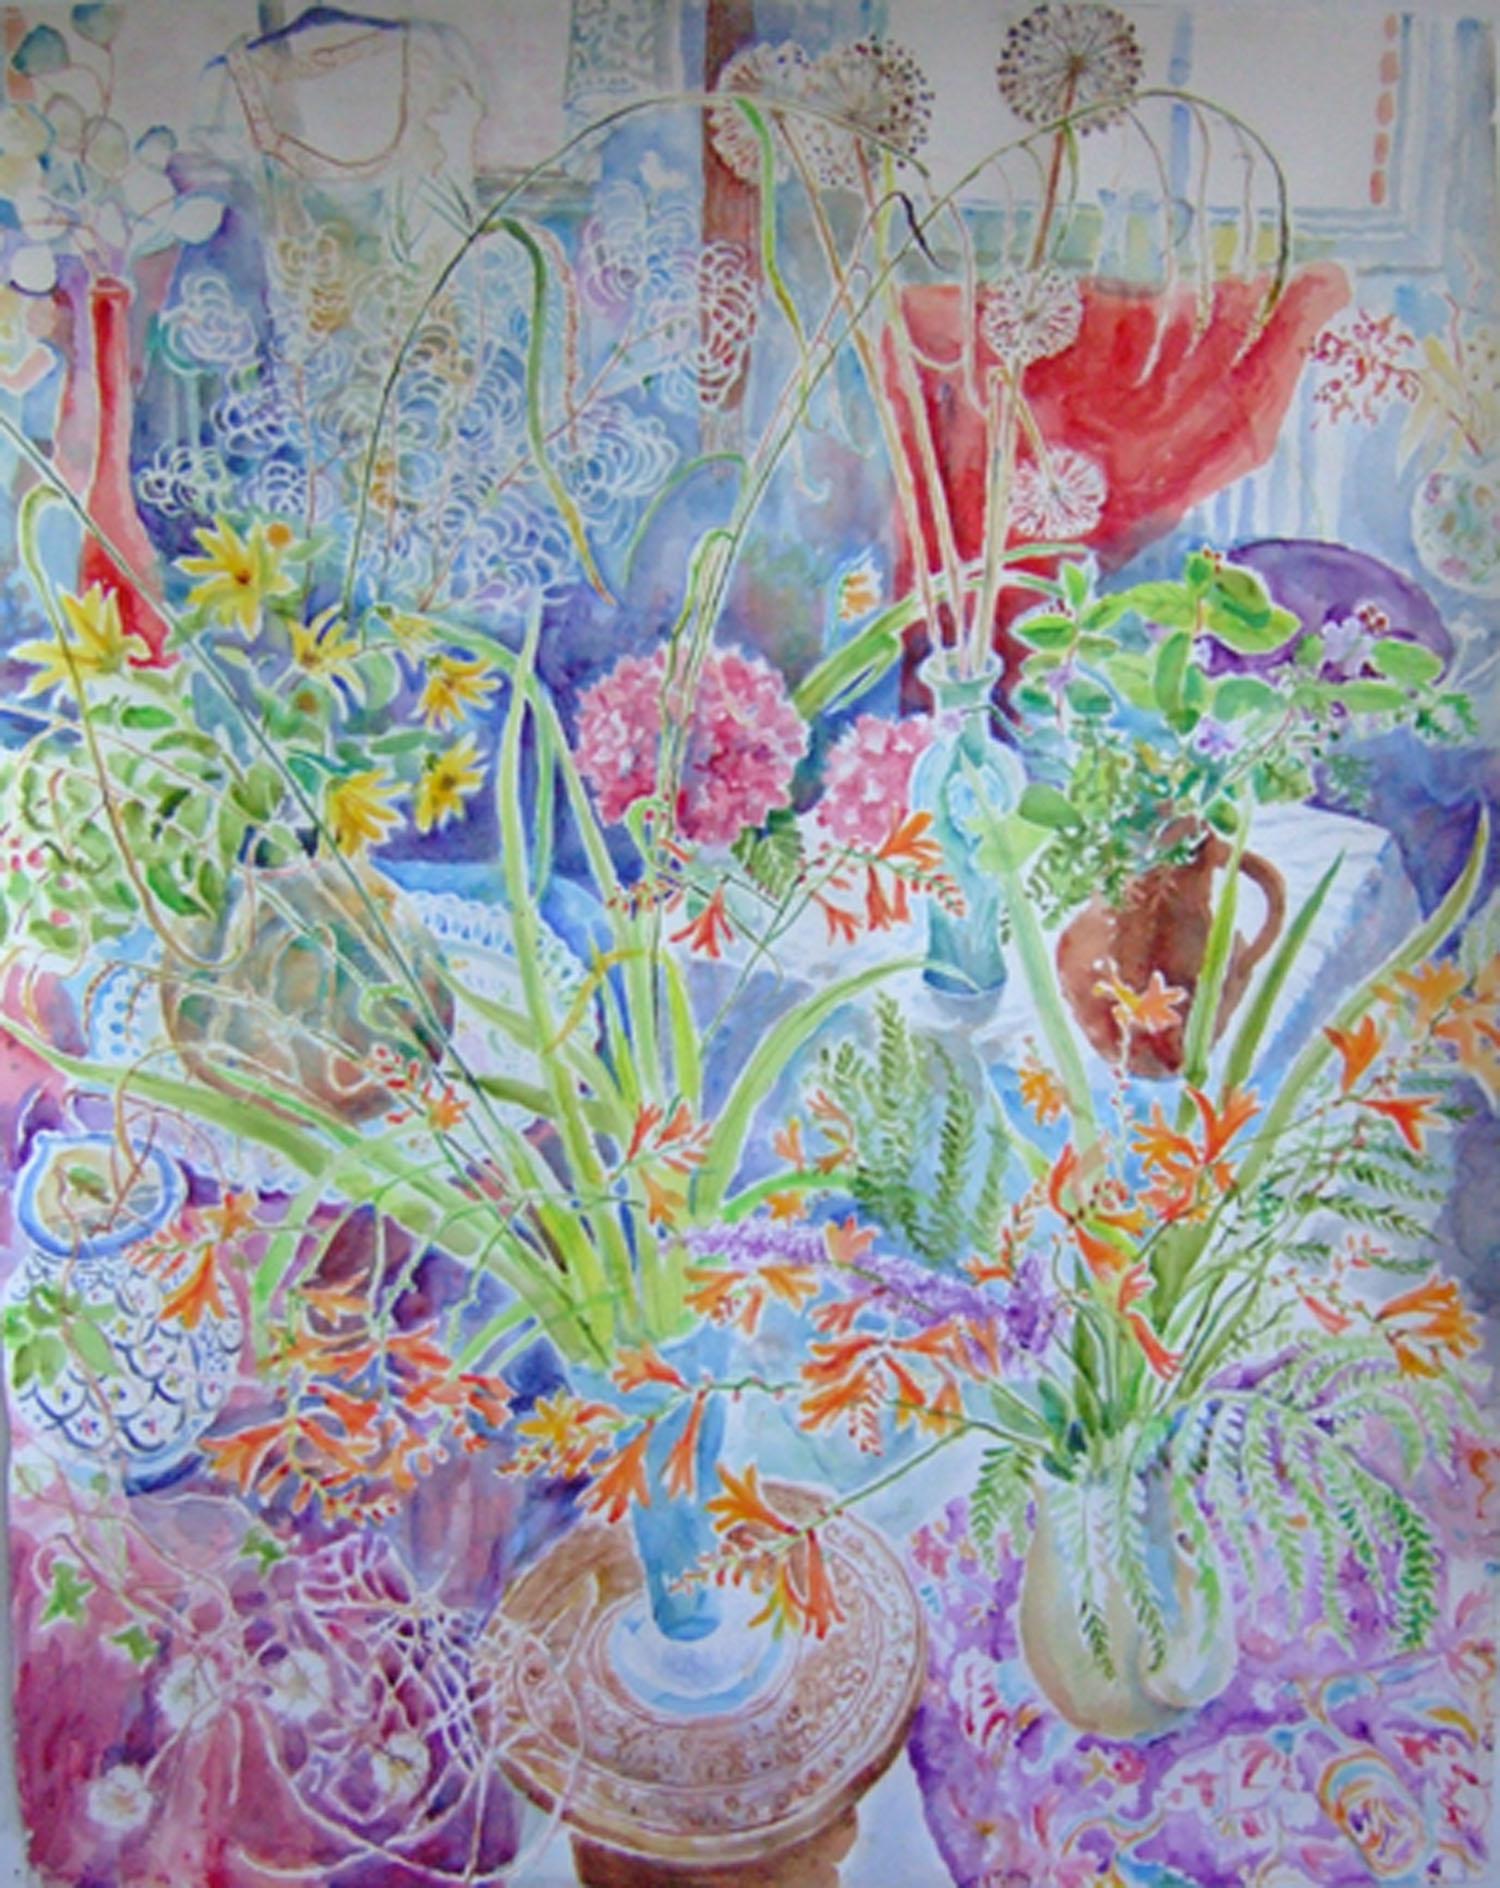 Sarah longley_-_Garden Flower_watercolour_152.5 x 122cm.jpg